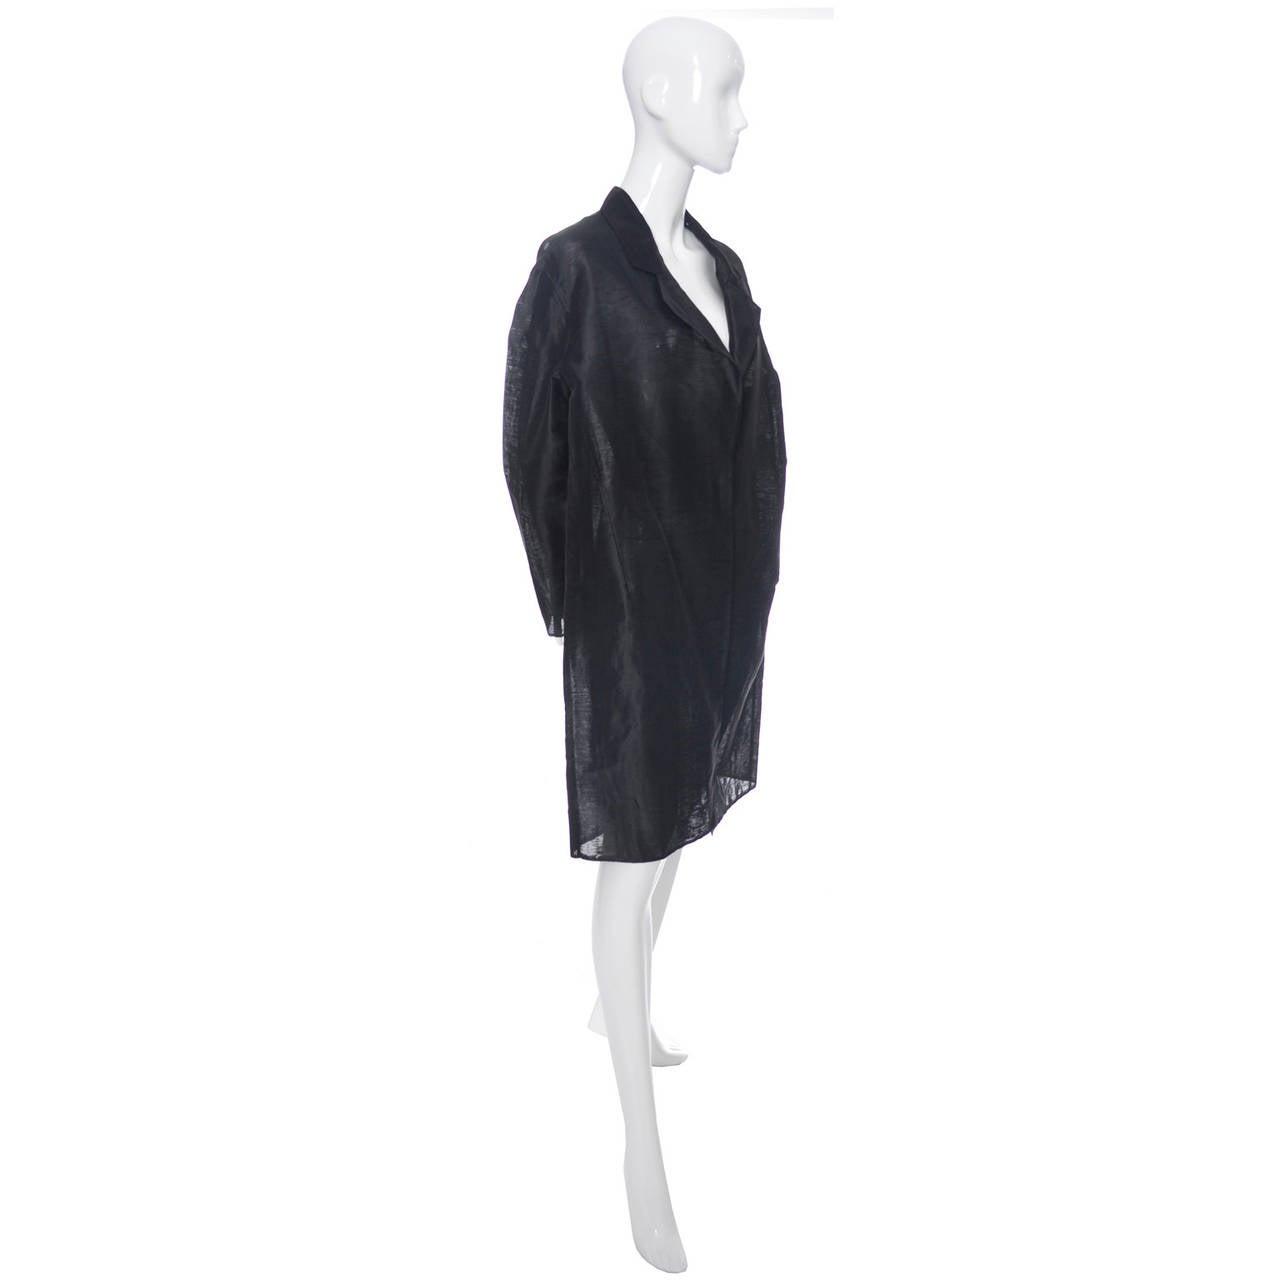 Donna Karan New York Black Label Linen Organza Evening Coat Semi Sheer In Excellent Condition In Portland, OR